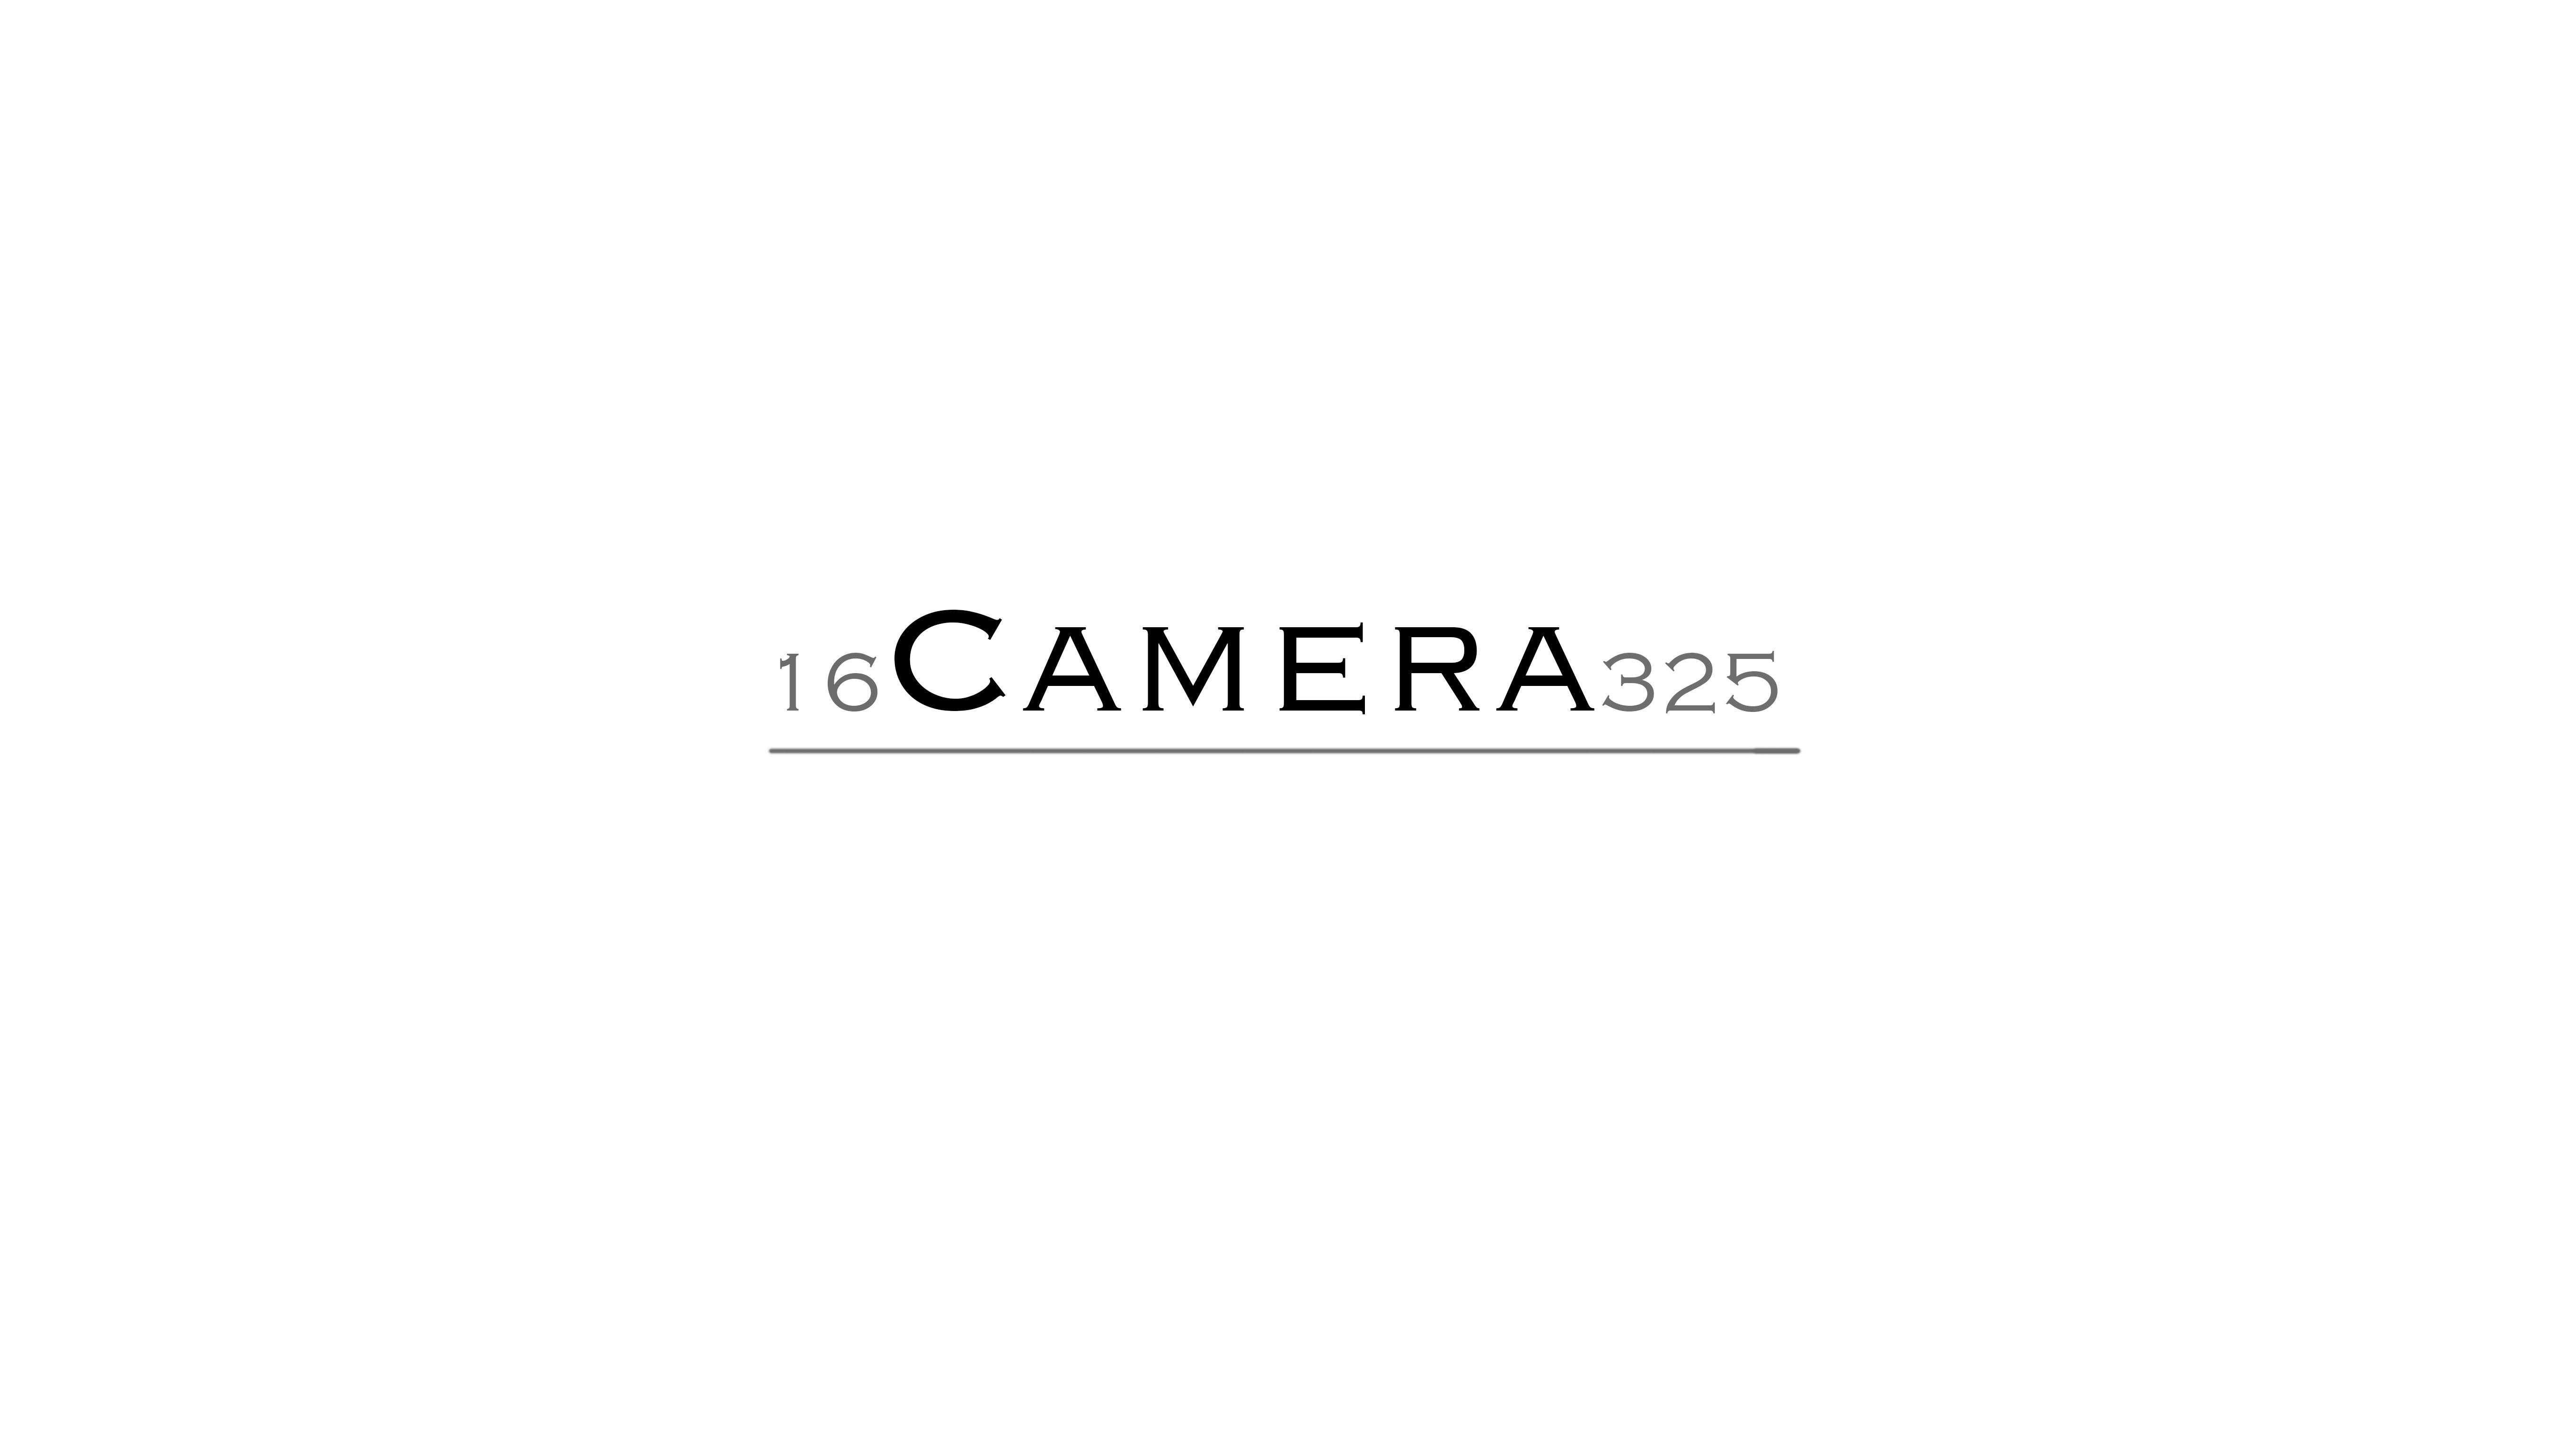 16camera325